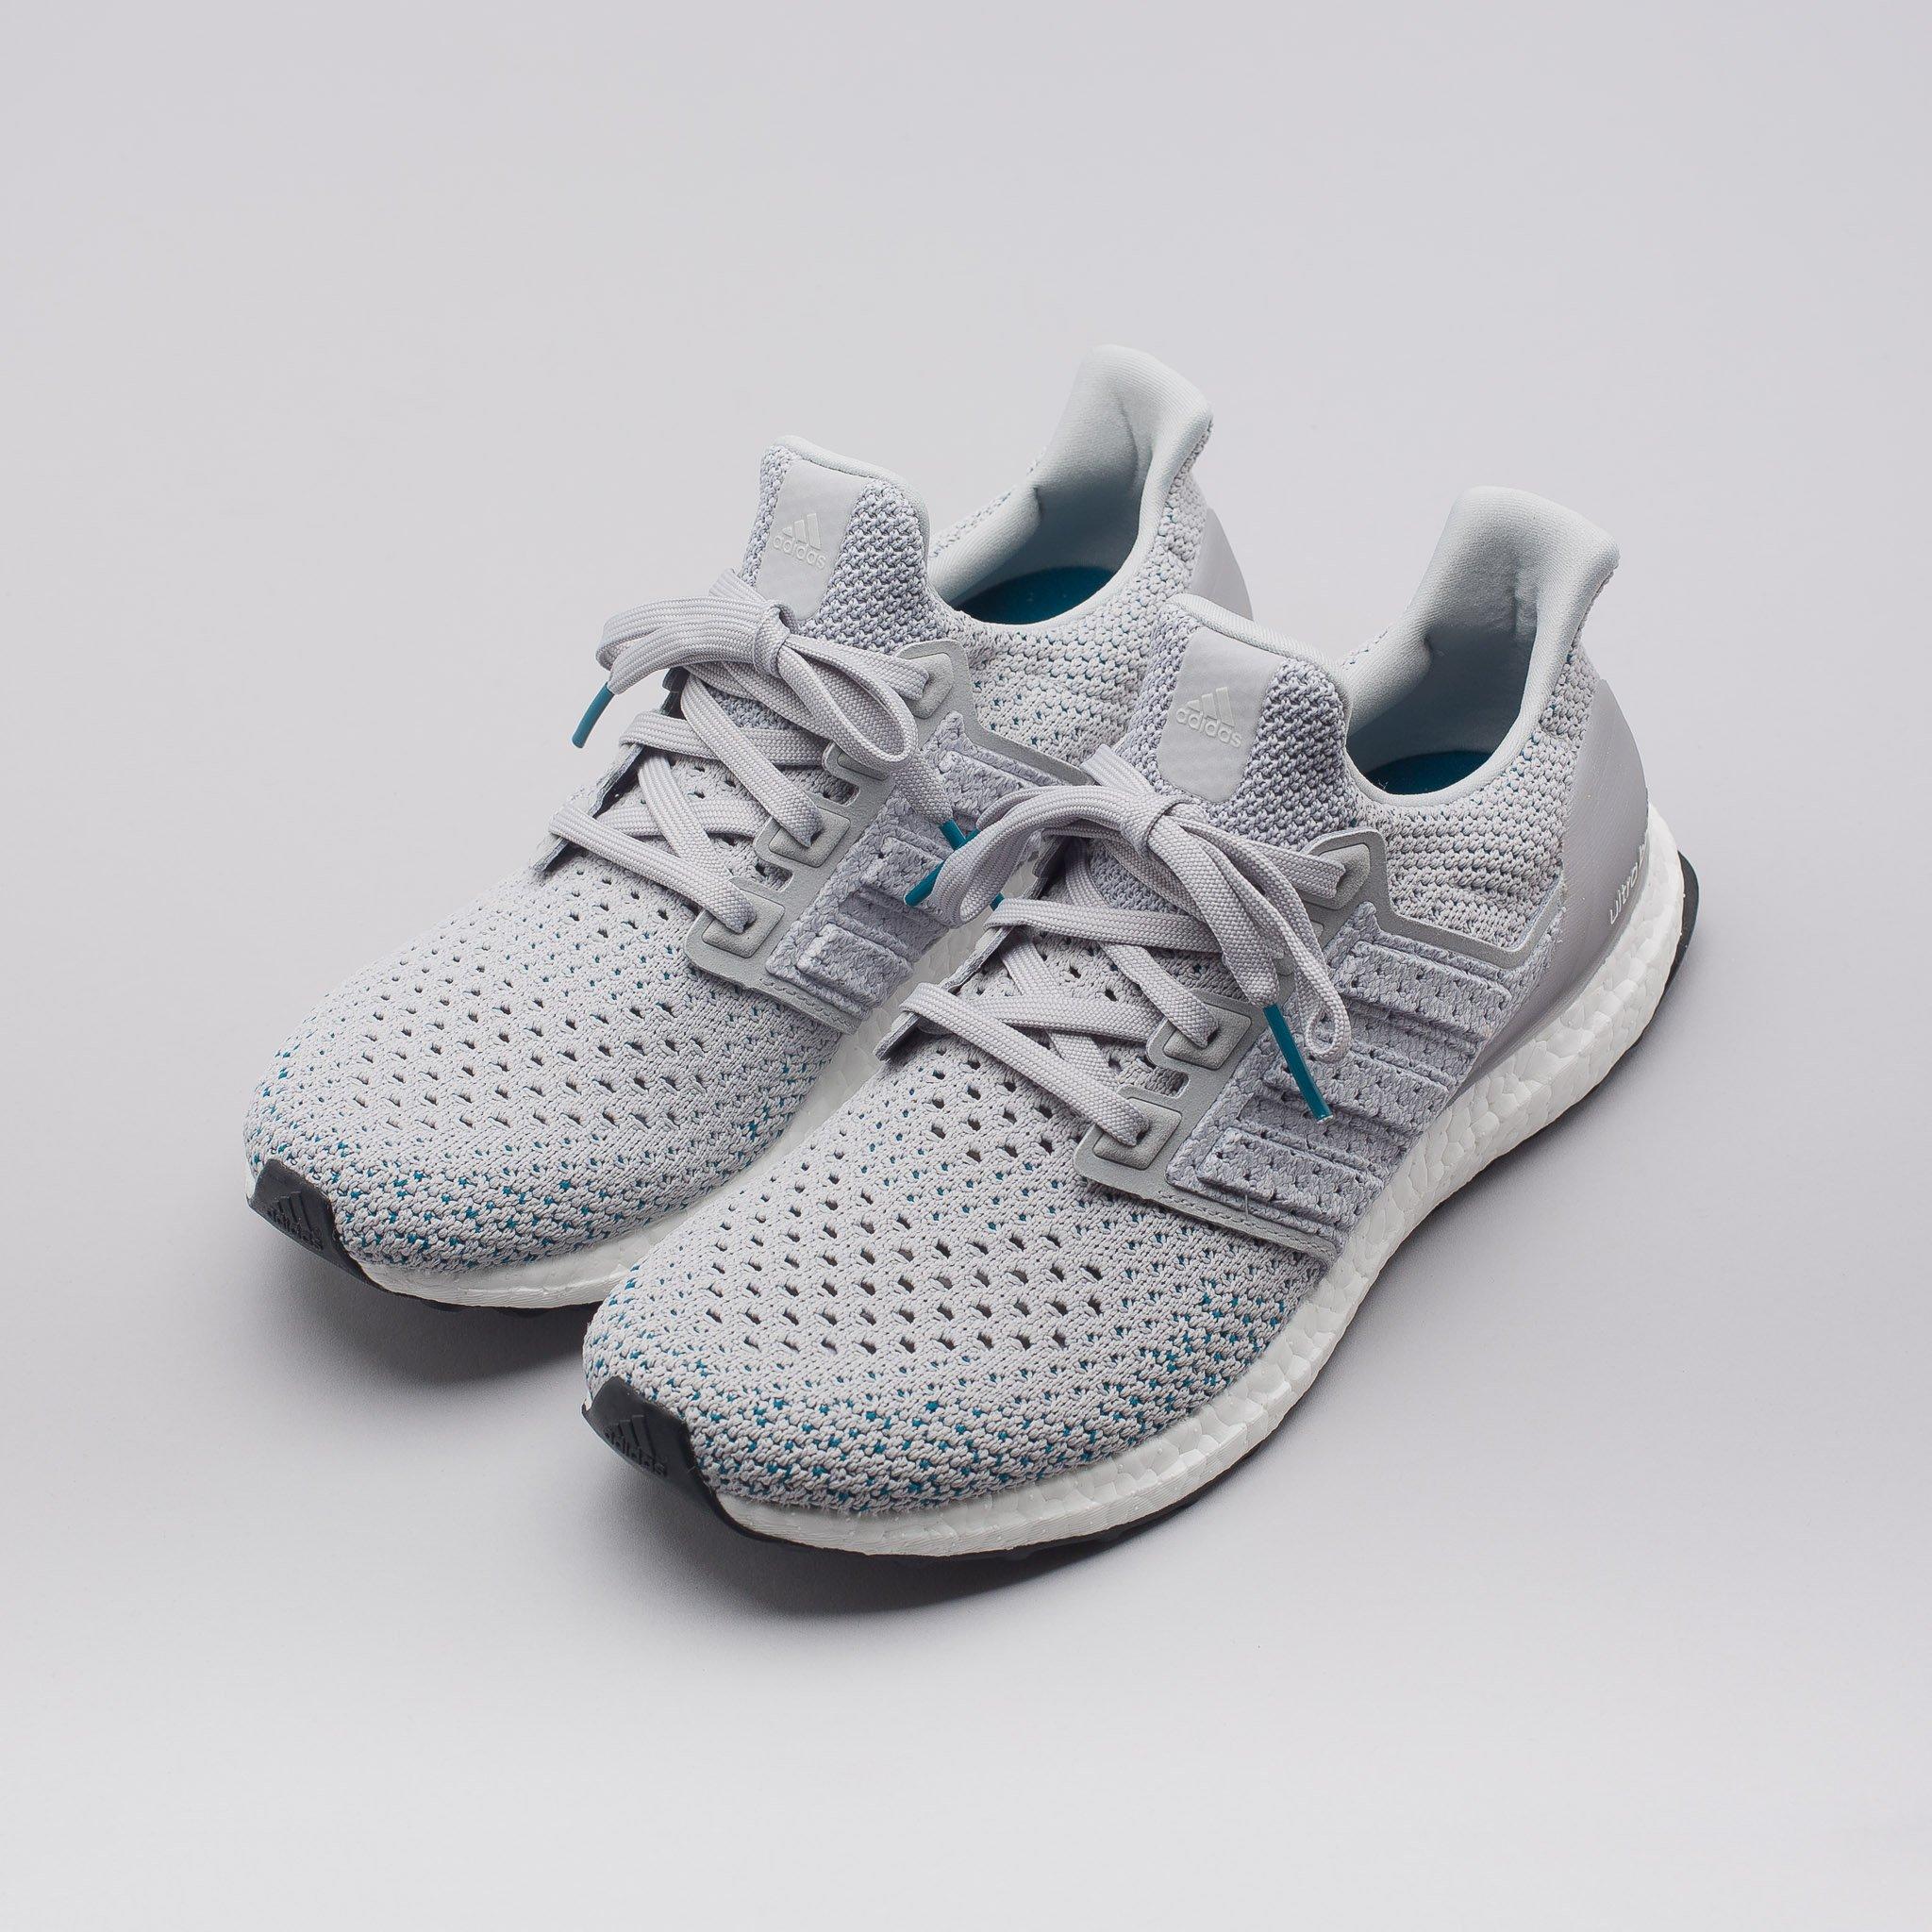 promo code ab1d2 55e65 adidas ultra boost clima grey grey